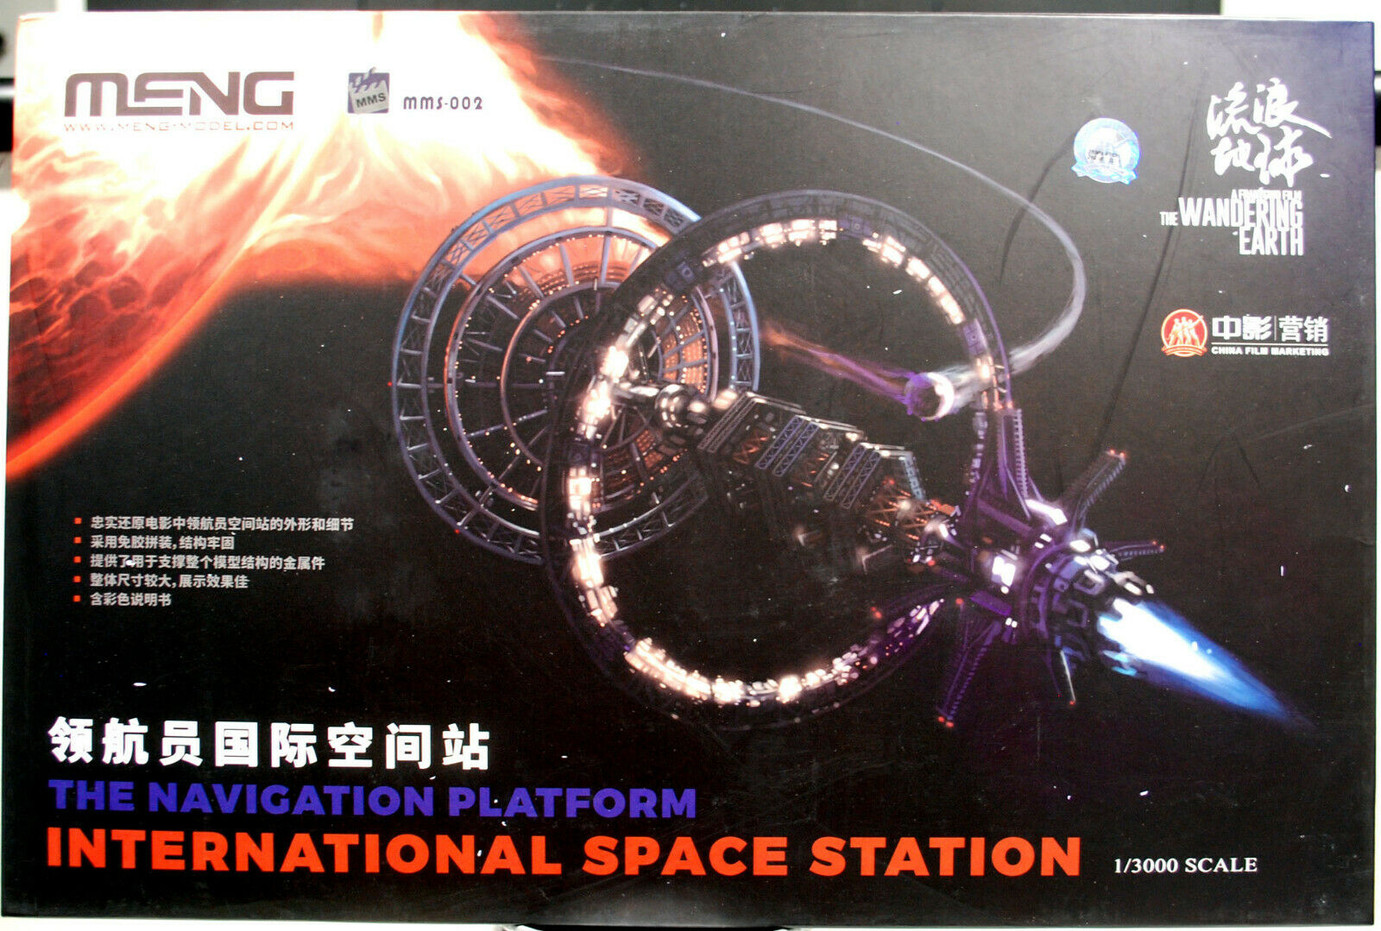 MENG International Space Station.jpg